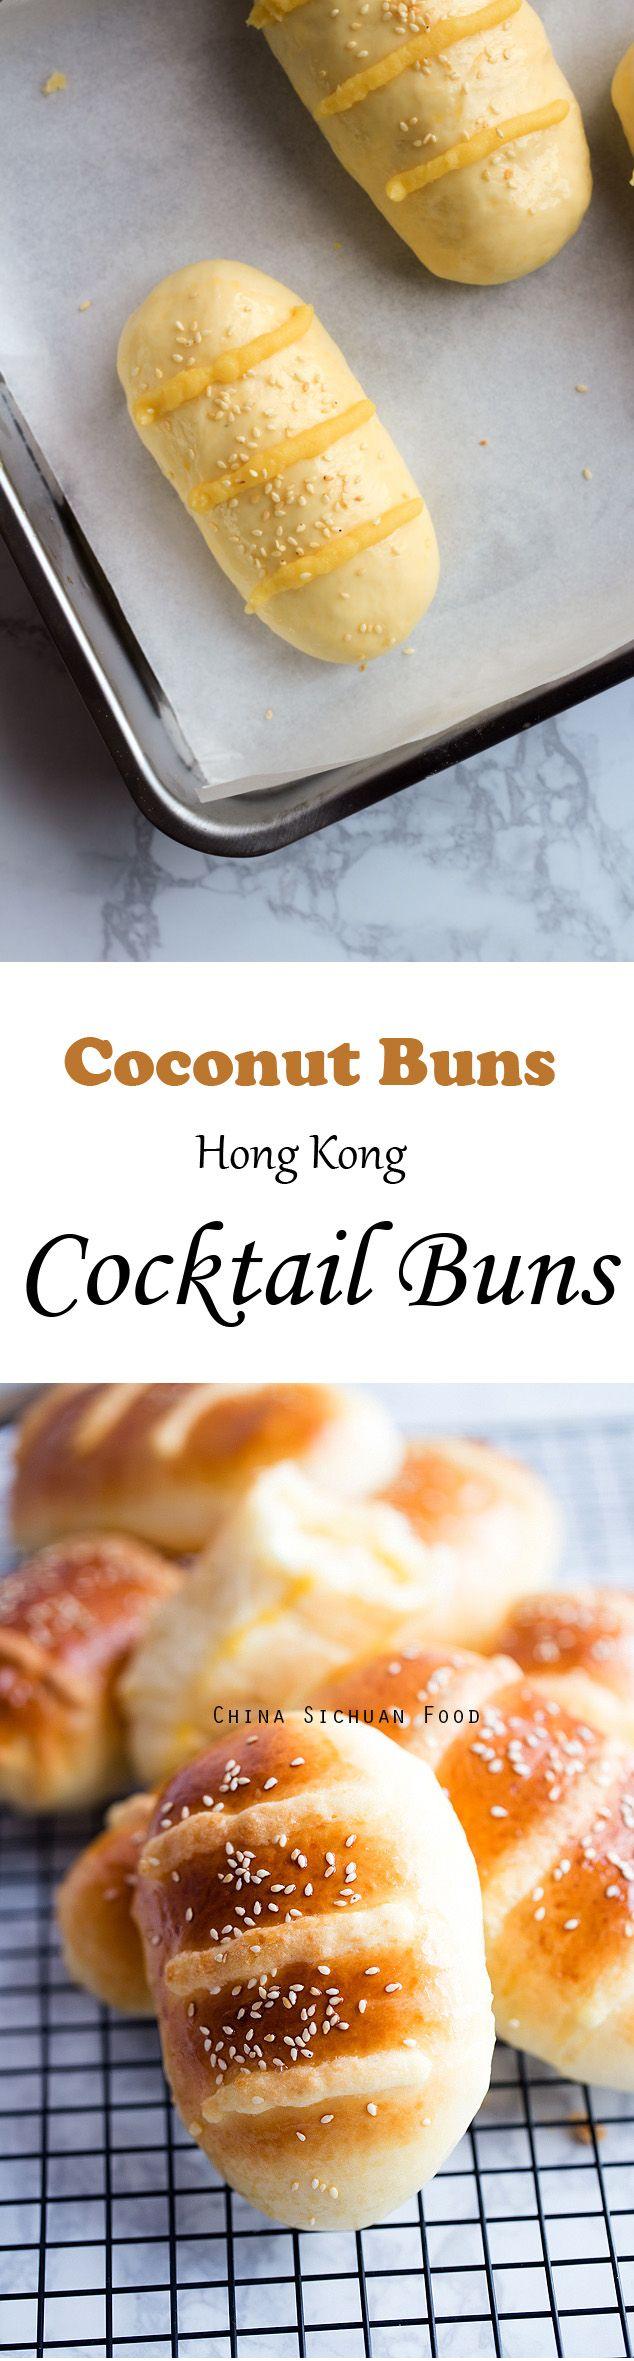 Coconut Buns (Cocktail Buns) | ChinaSichuanFood.com